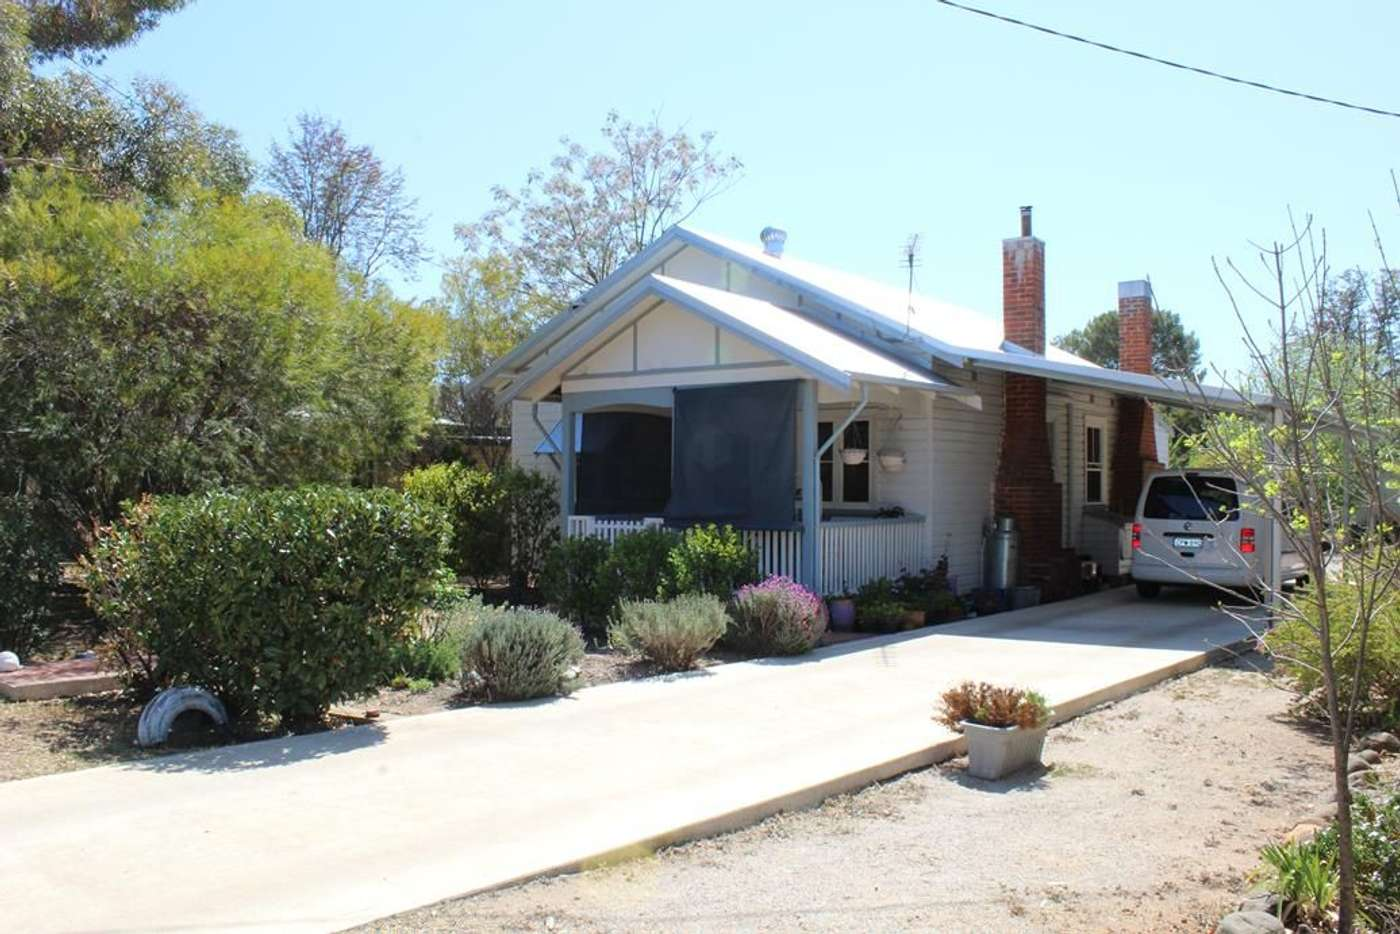 Main view of Homely house listing, 15 Frazer, Bingara NSW 2404